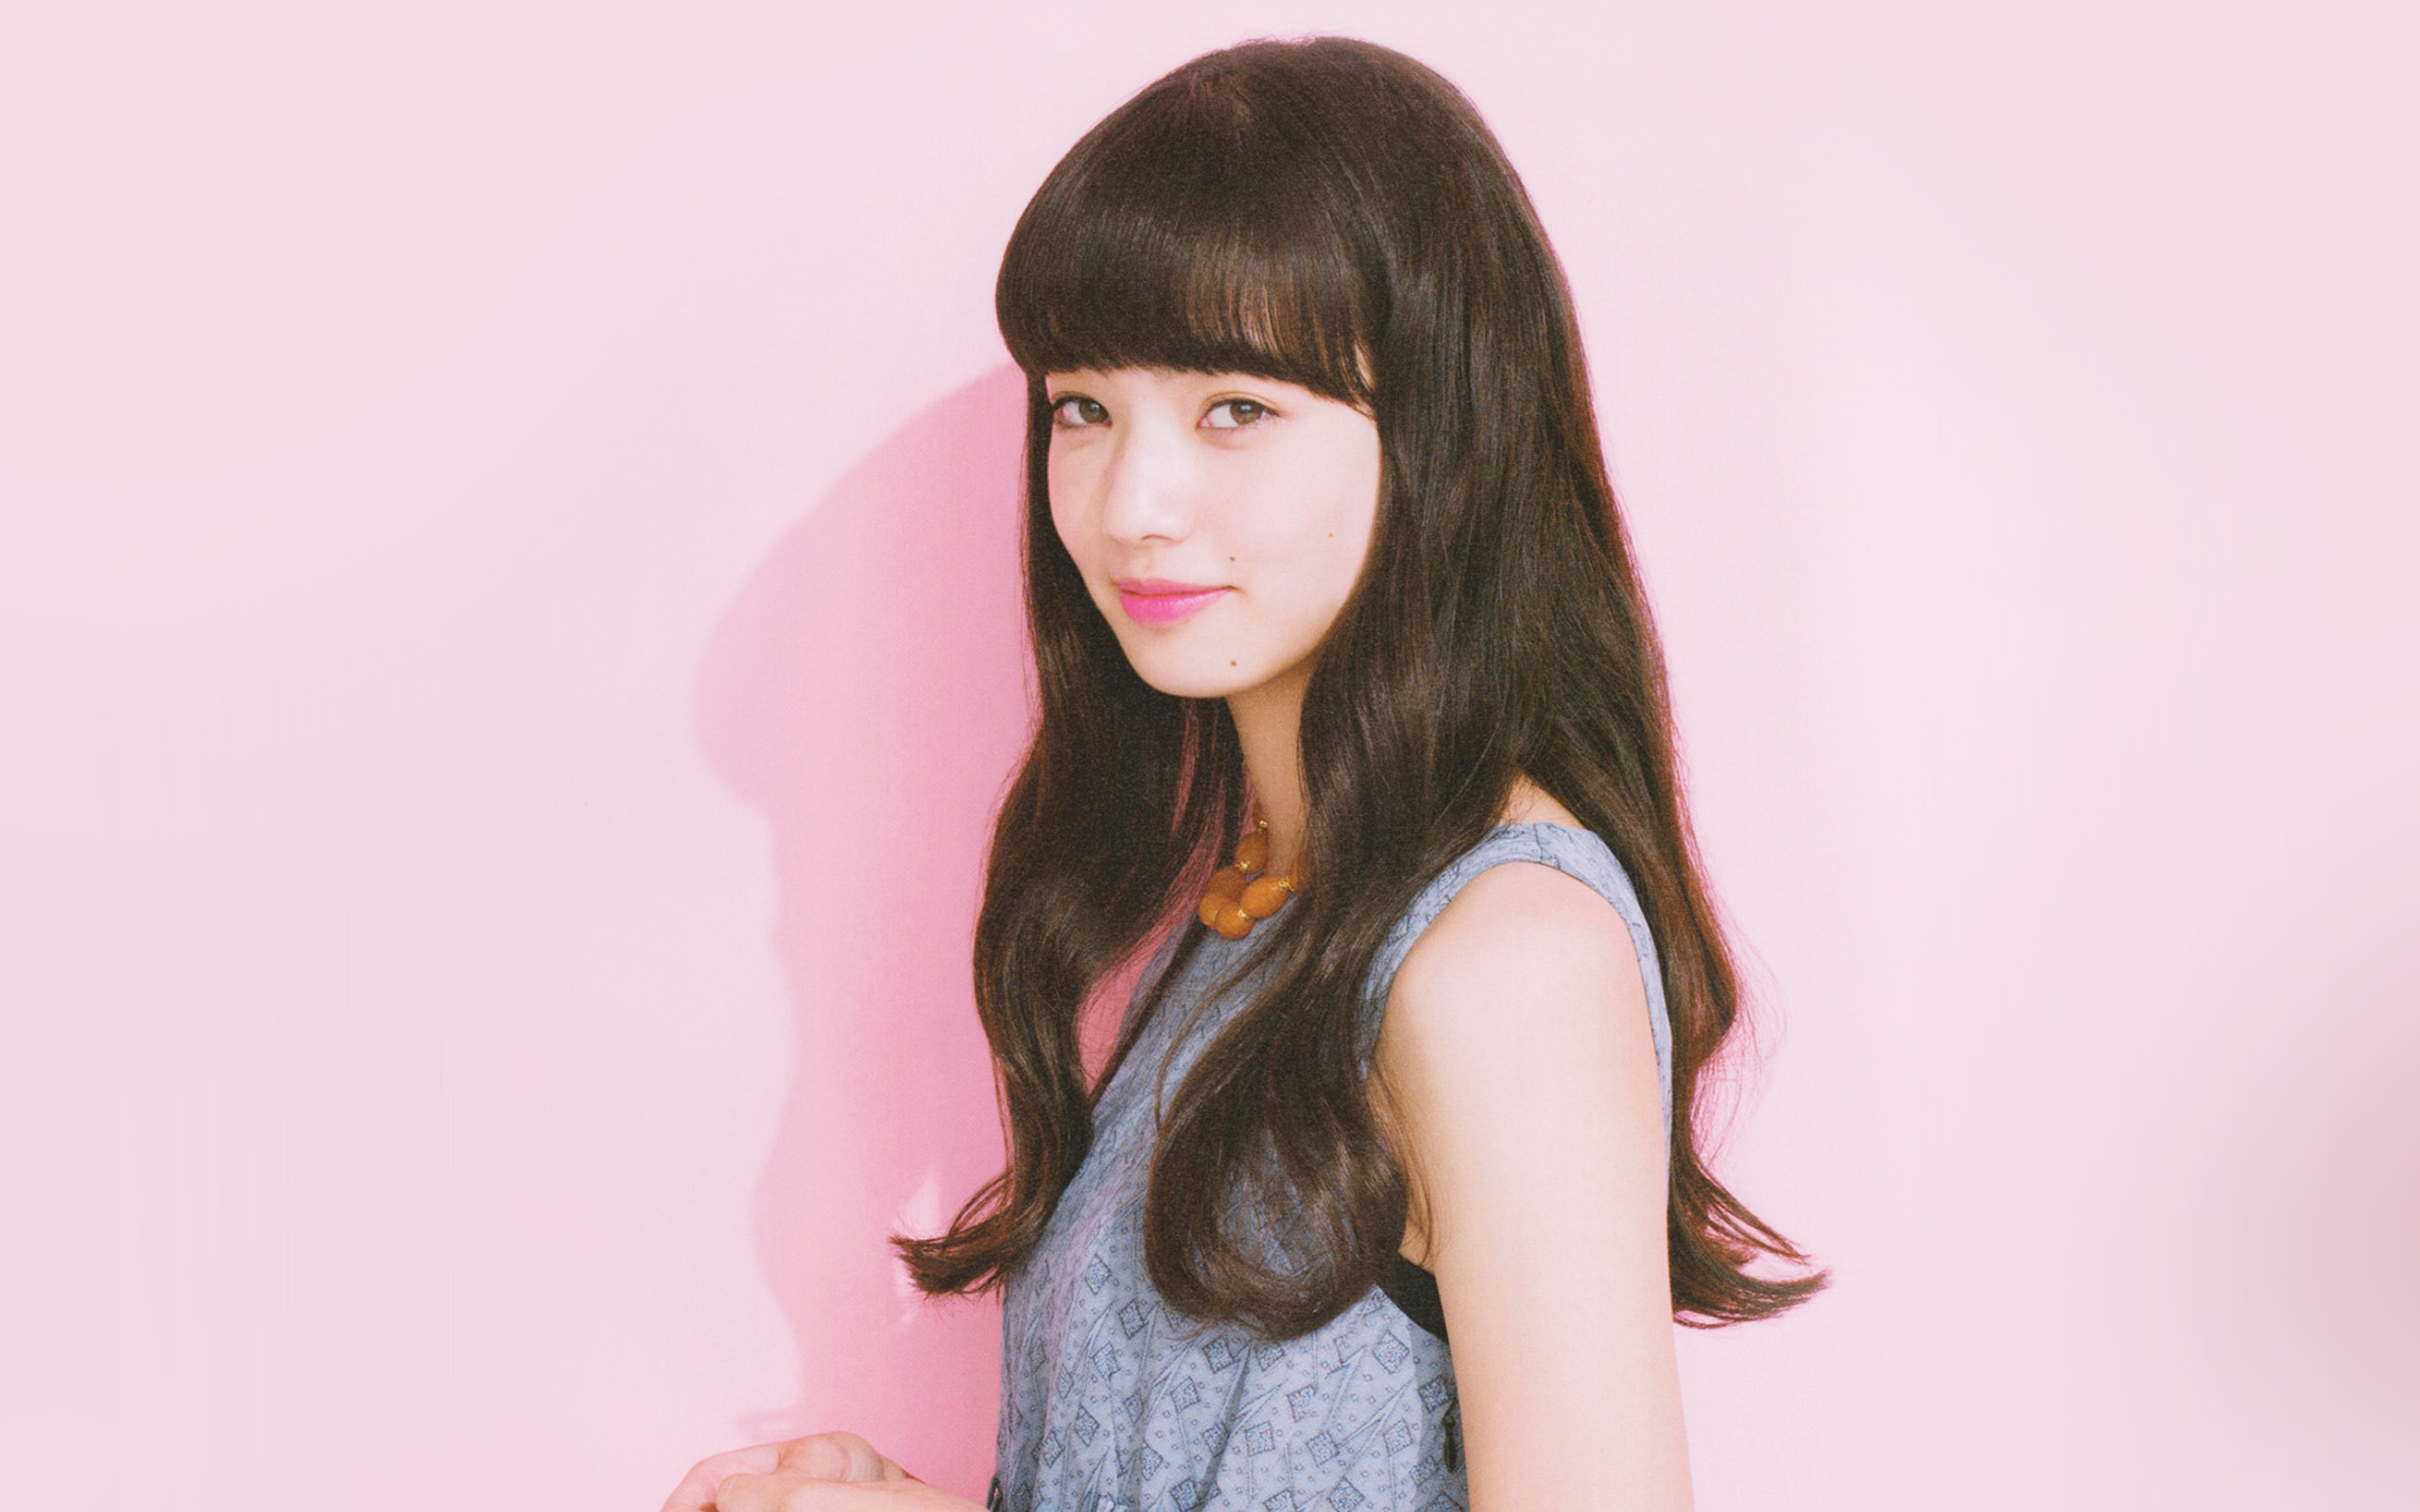 Imac Girl Wallpaper Hn41 Nana Komatsu Cute Film Asian Girl Wallpaper